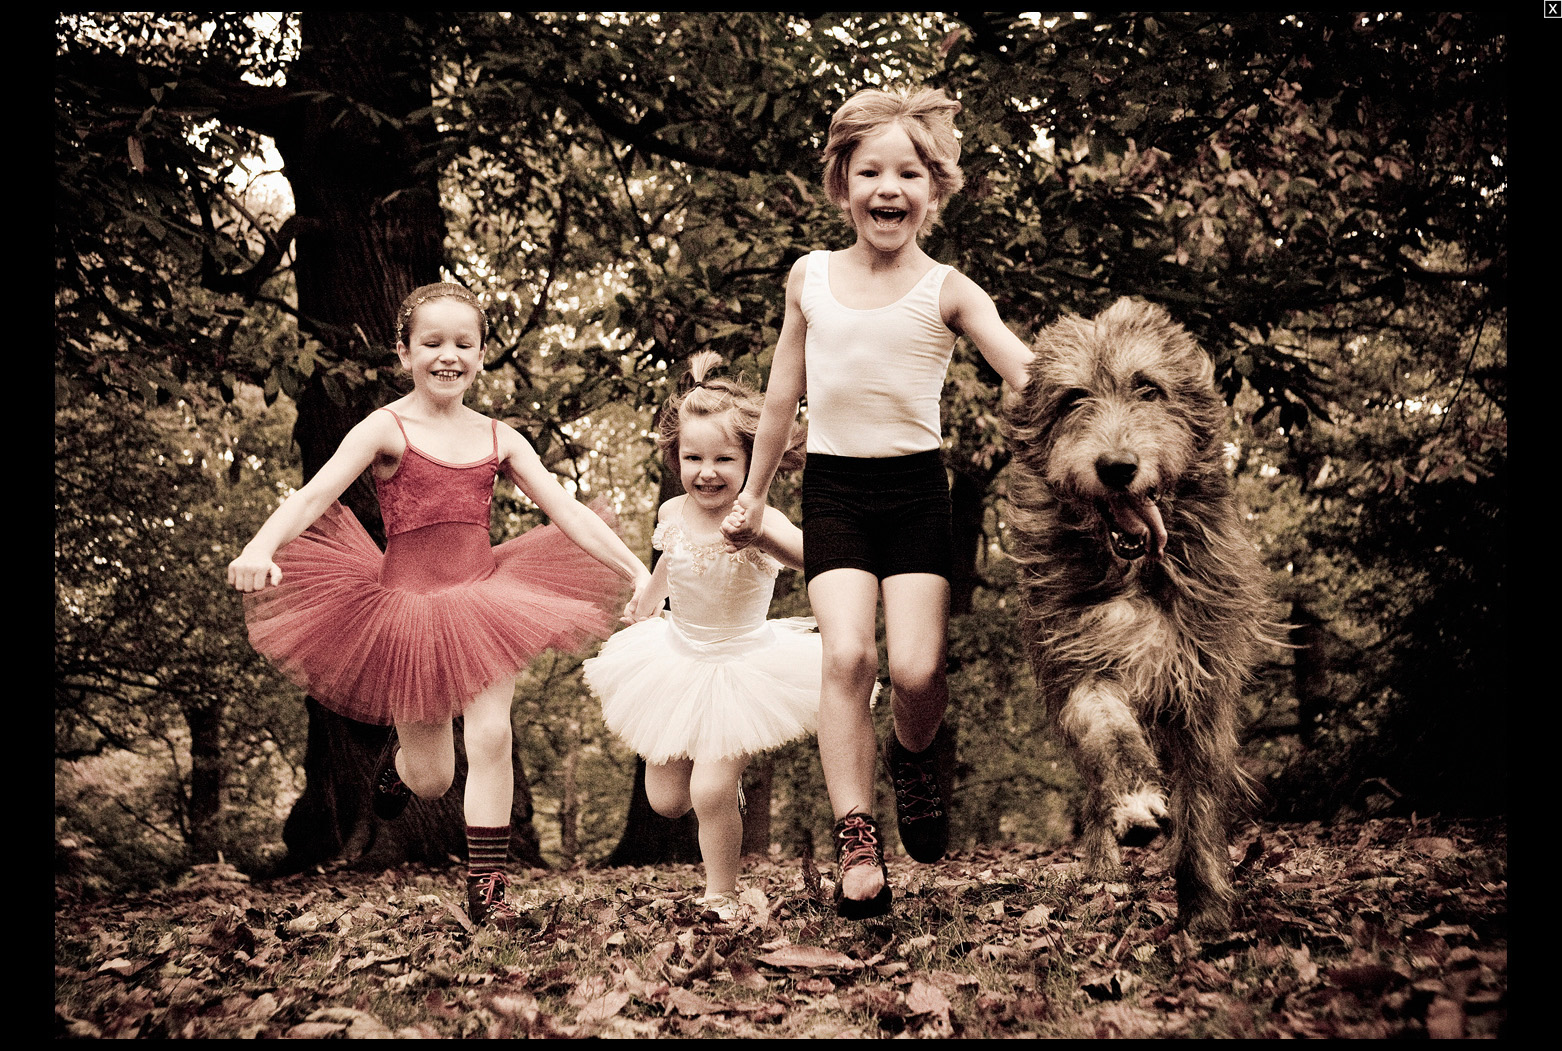 Lilly, Pani, Bear & Harris